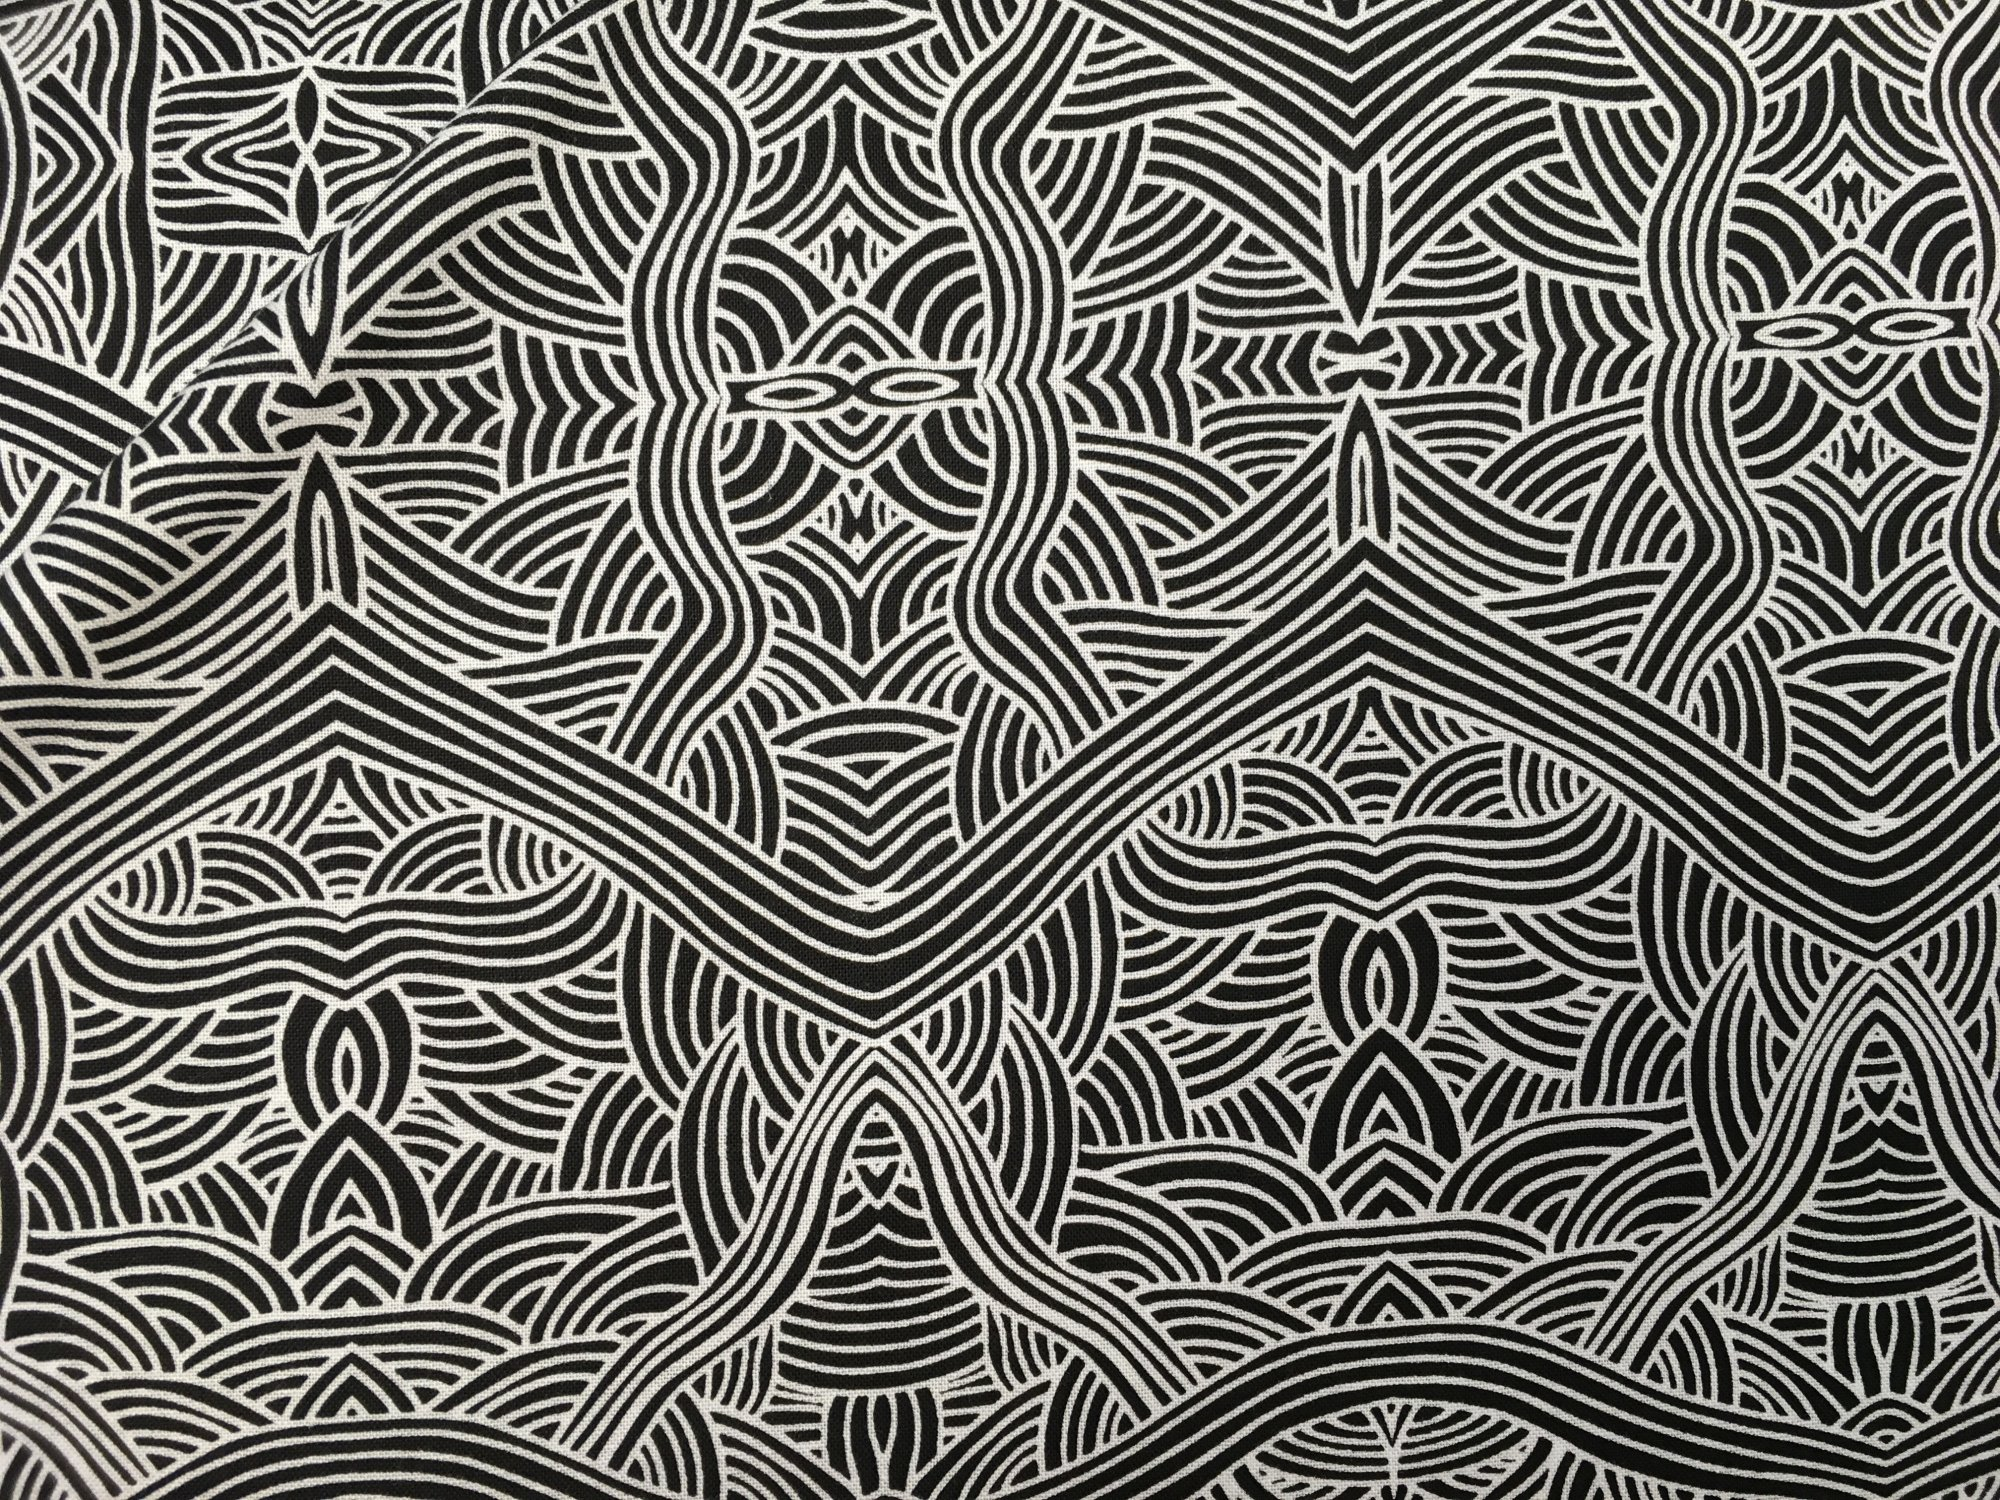 UNTITLED BLACK UNB by M&S Textiles